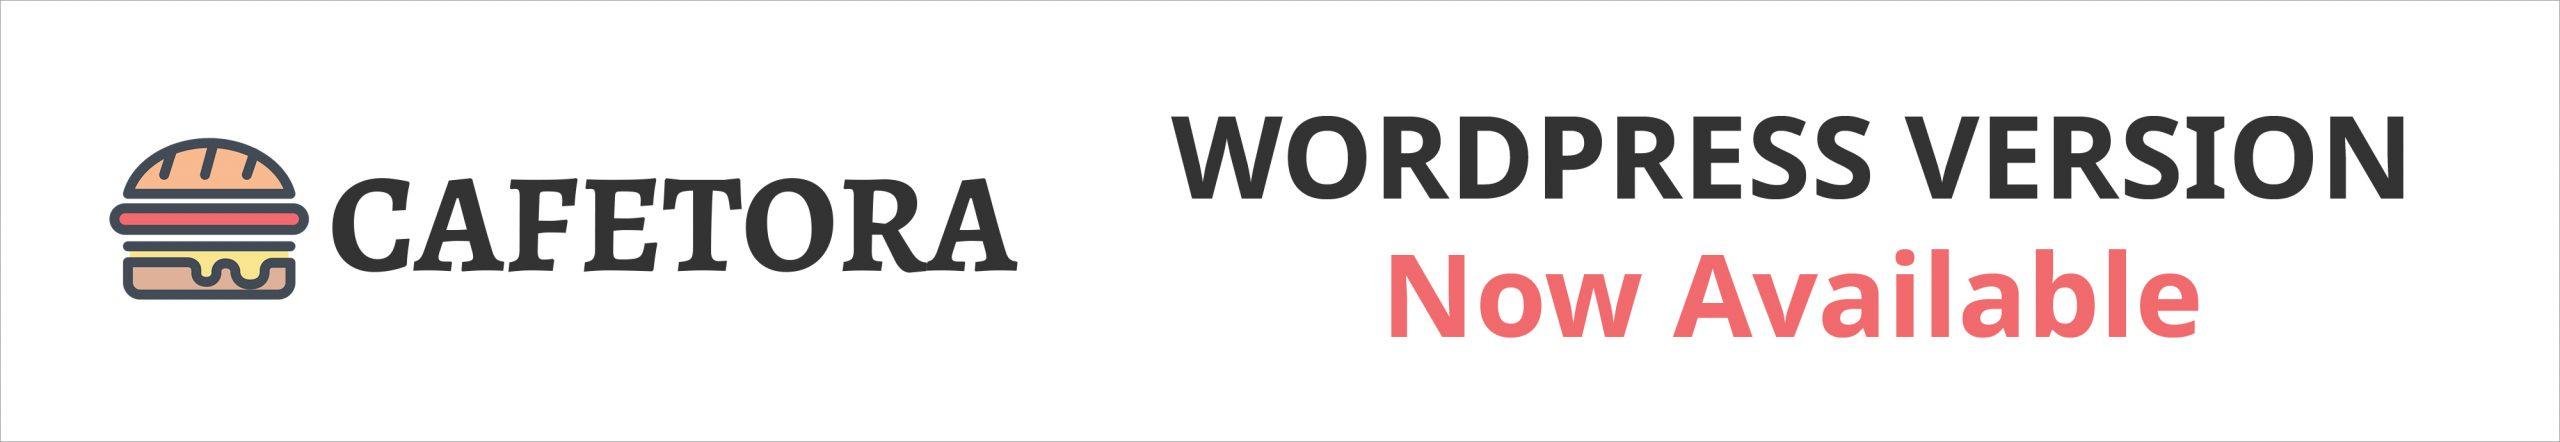 Cafetora WordPress version